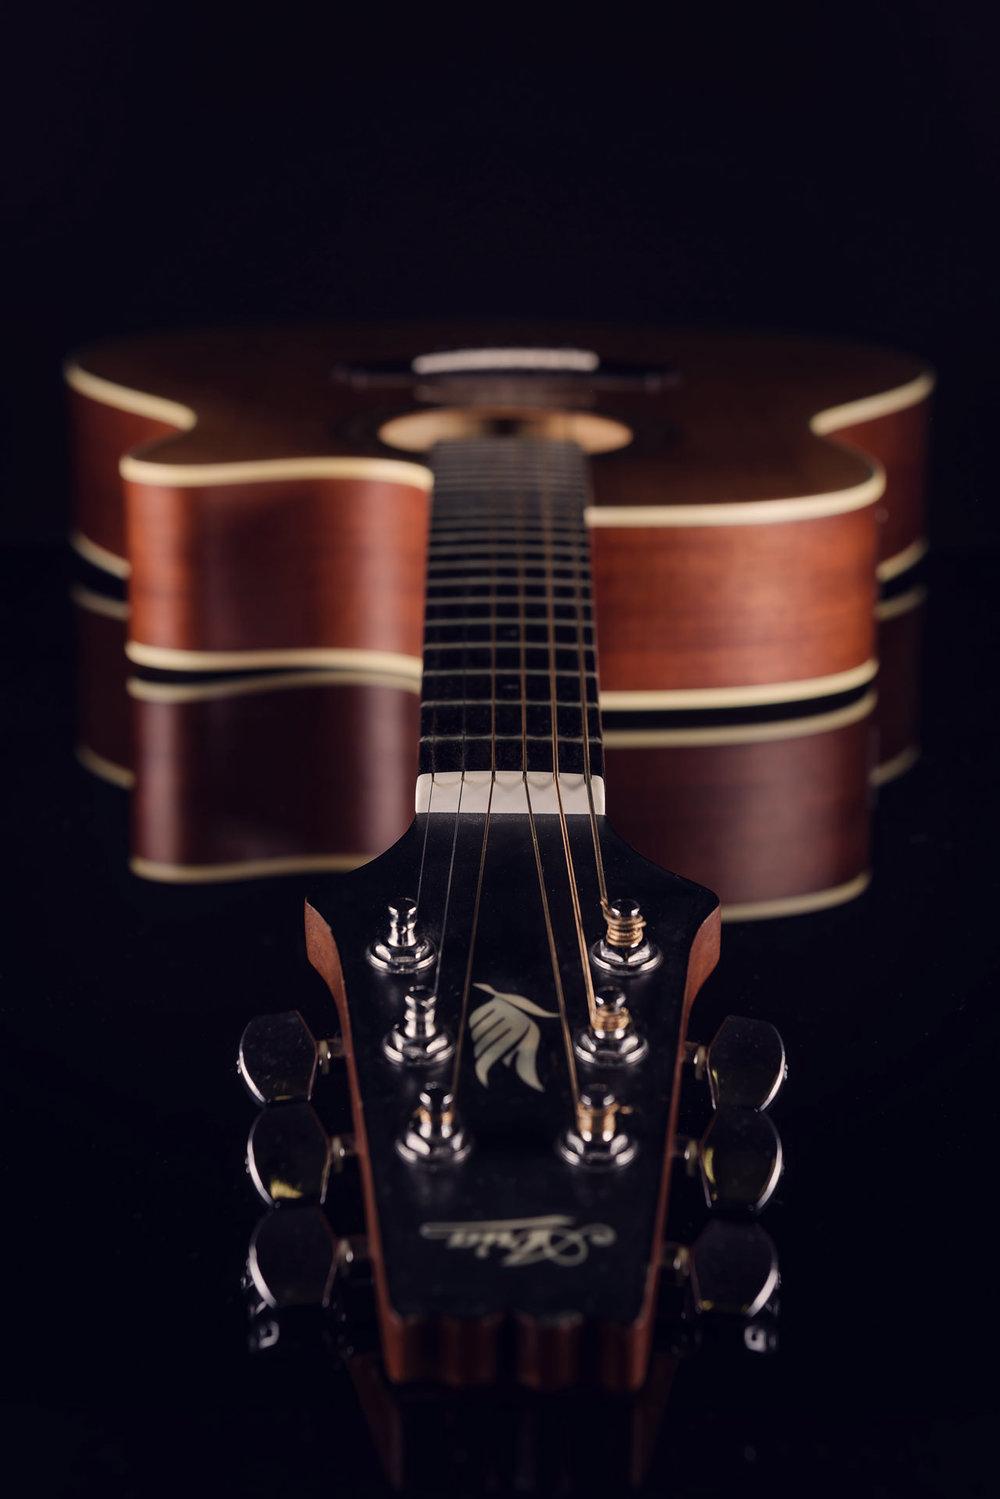 Guitar02 Produkt Advertising Werbung by JHofer-Foto Juergen Hofer